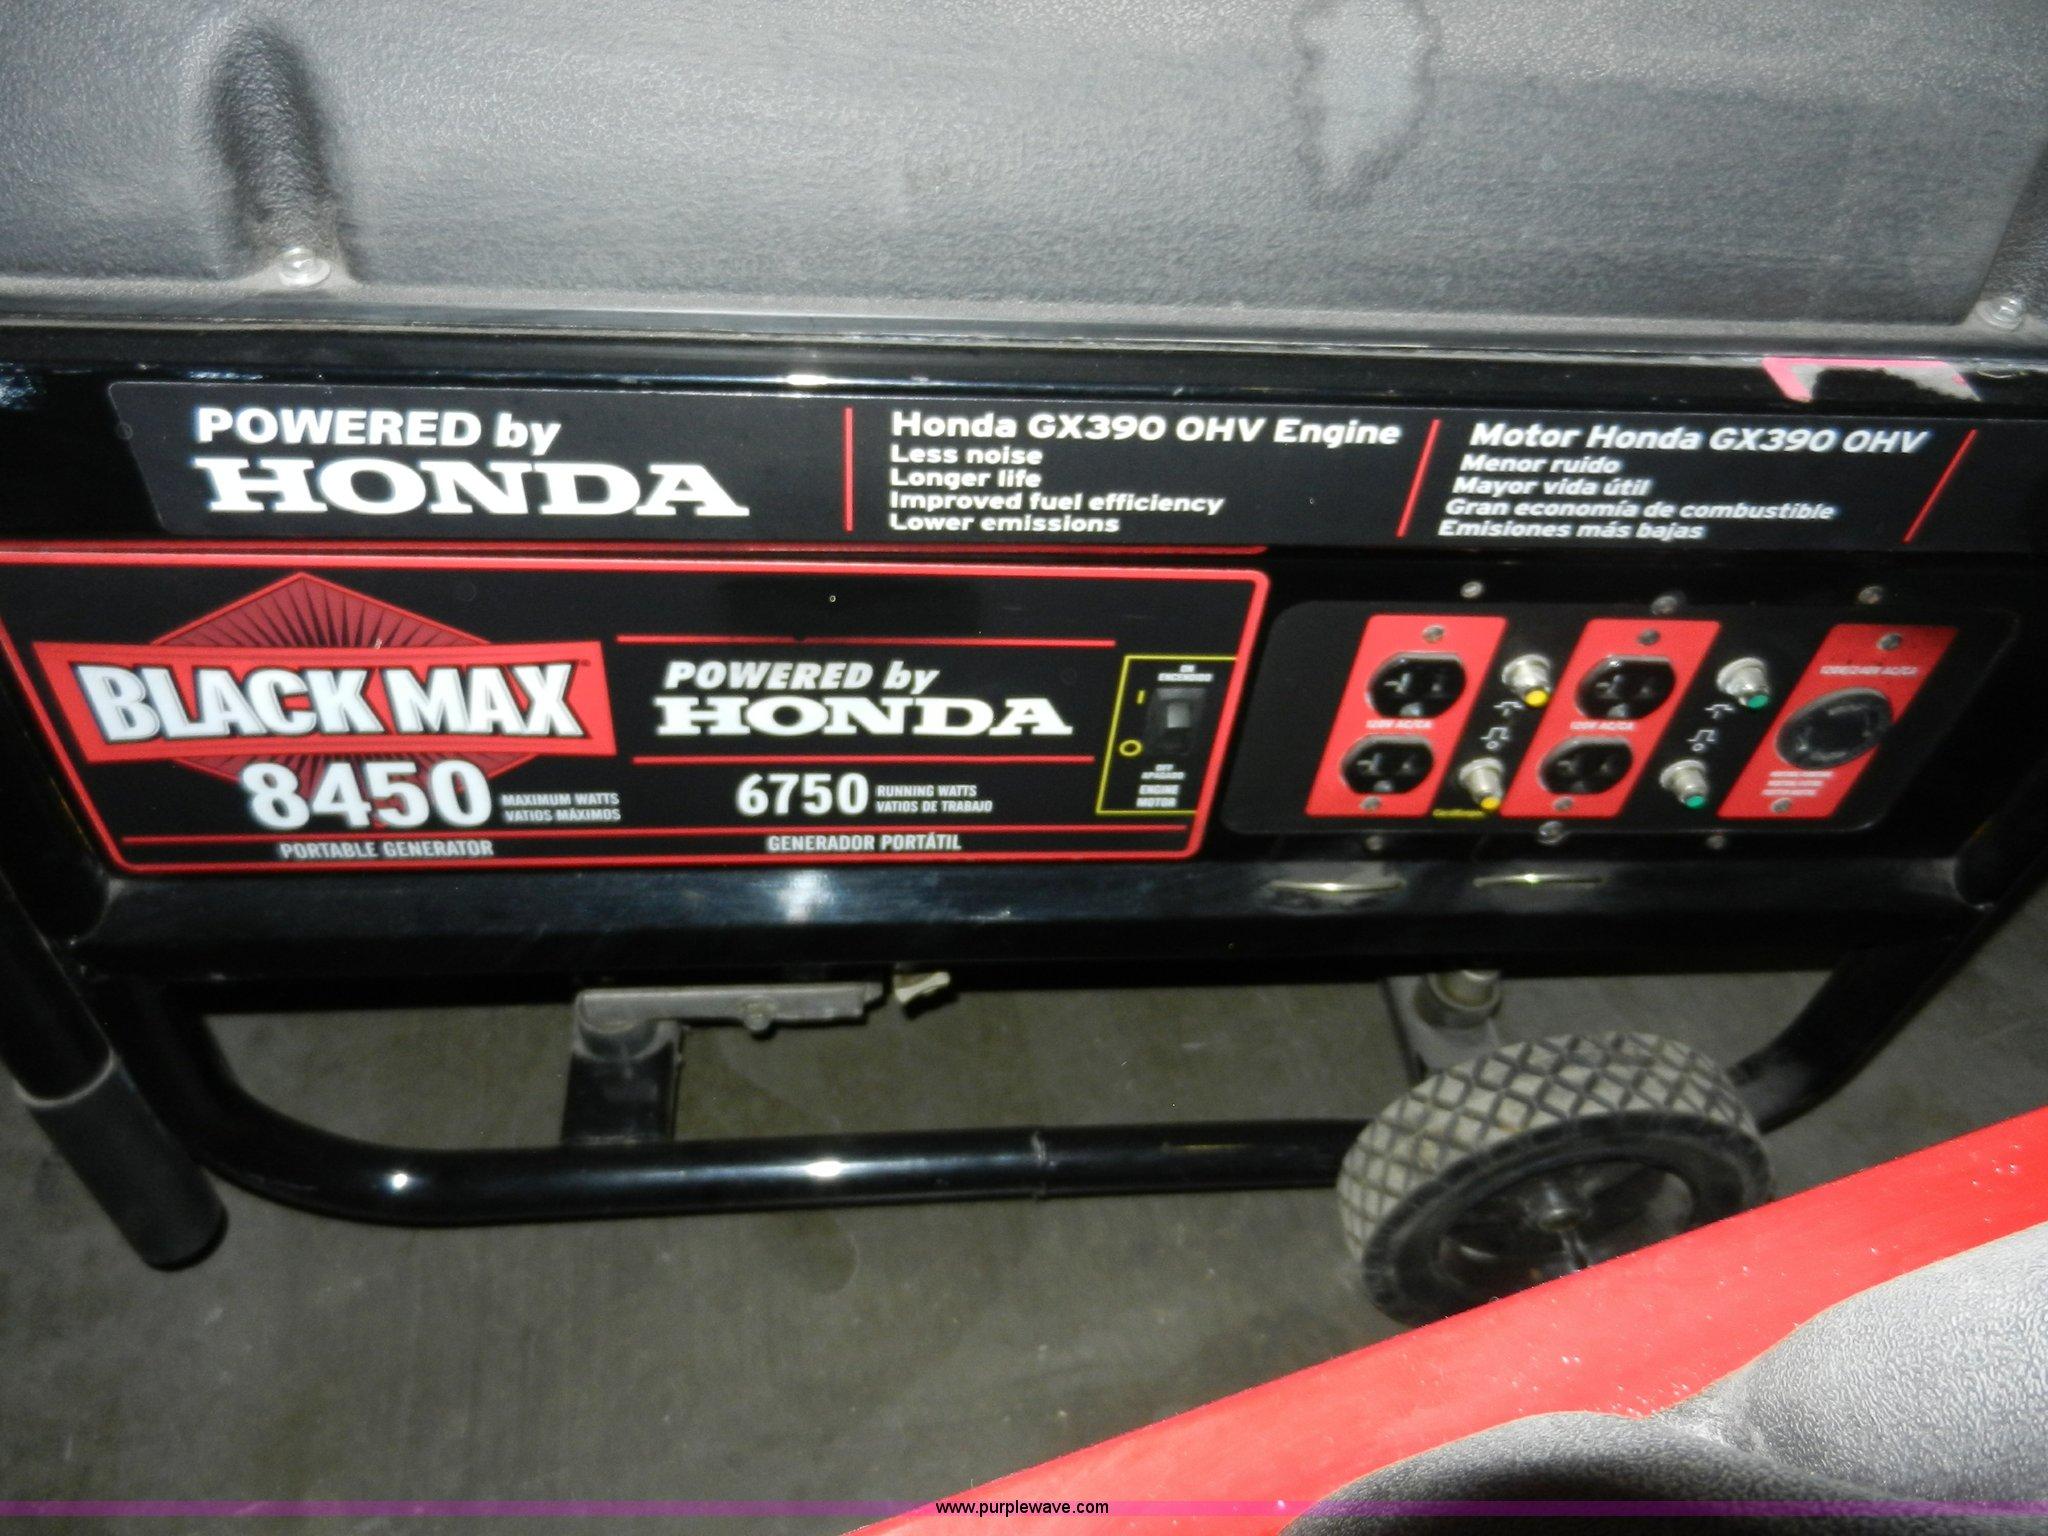 Honda black max 8450 generator manual